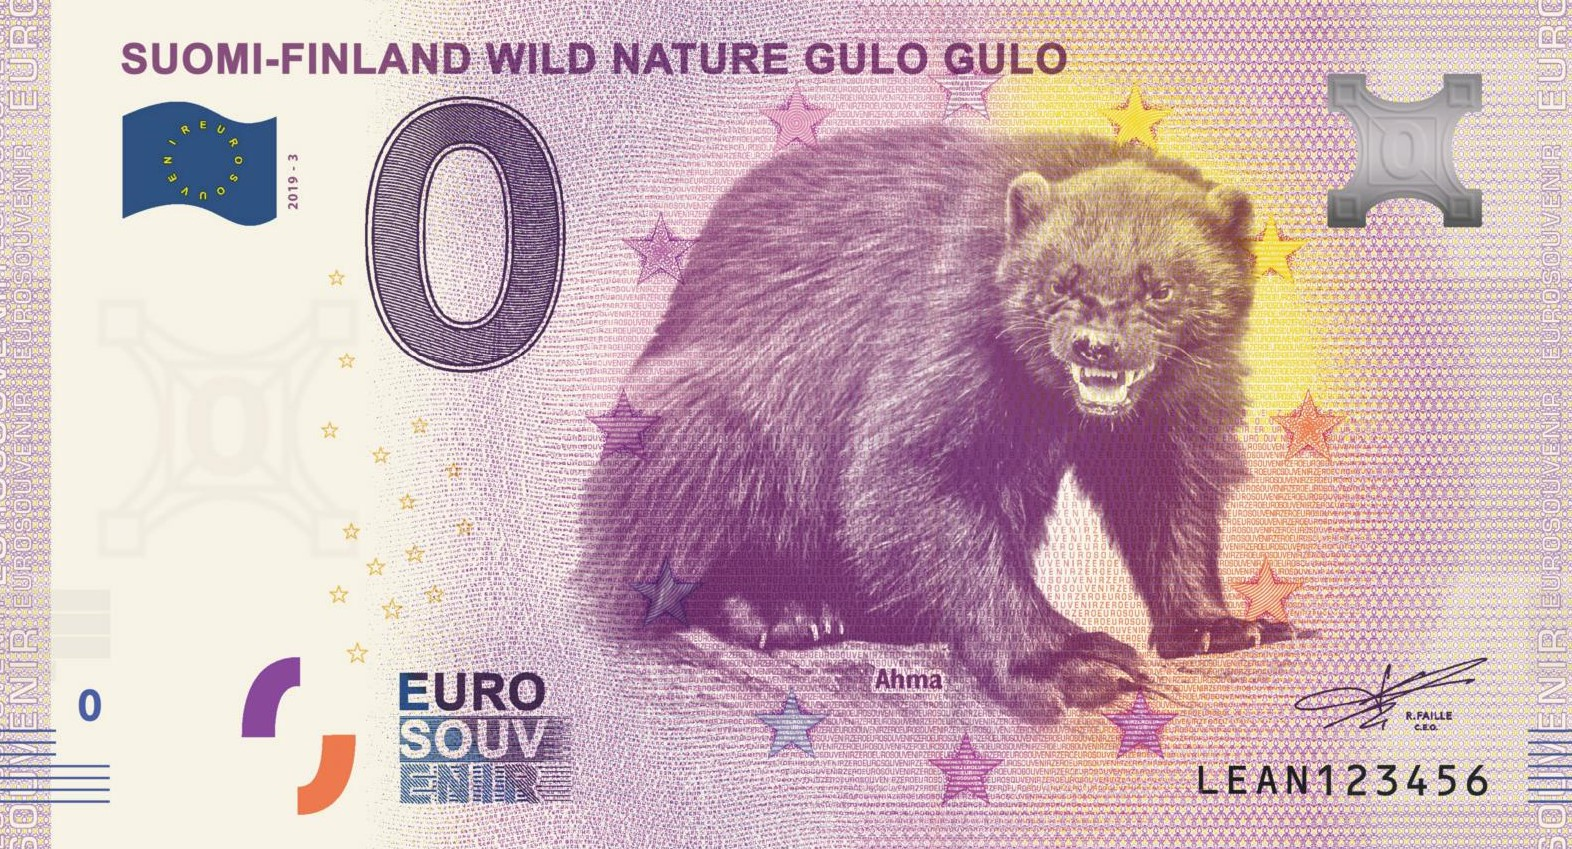 suomi 2019-3 LEAN WILD NATURE AHMA GULO GULO.jpg